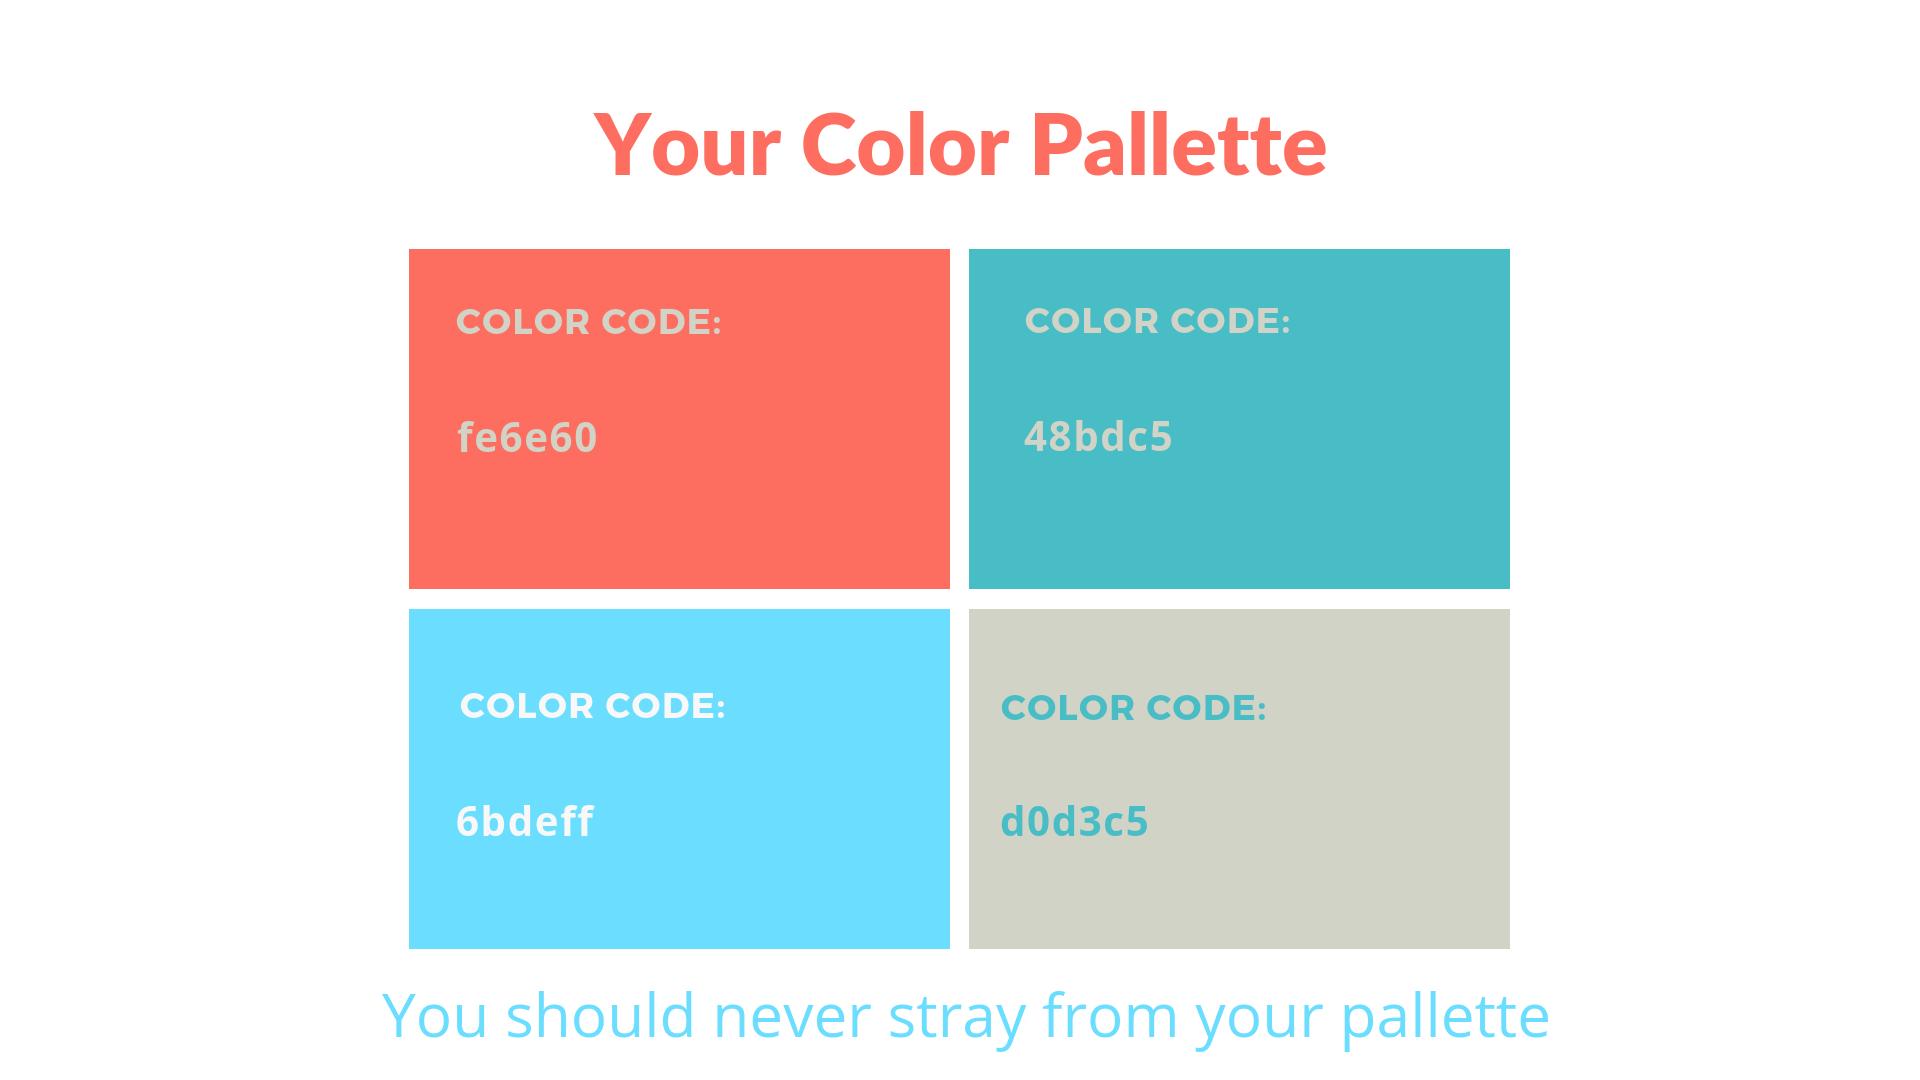 Style Guide Color Pallette